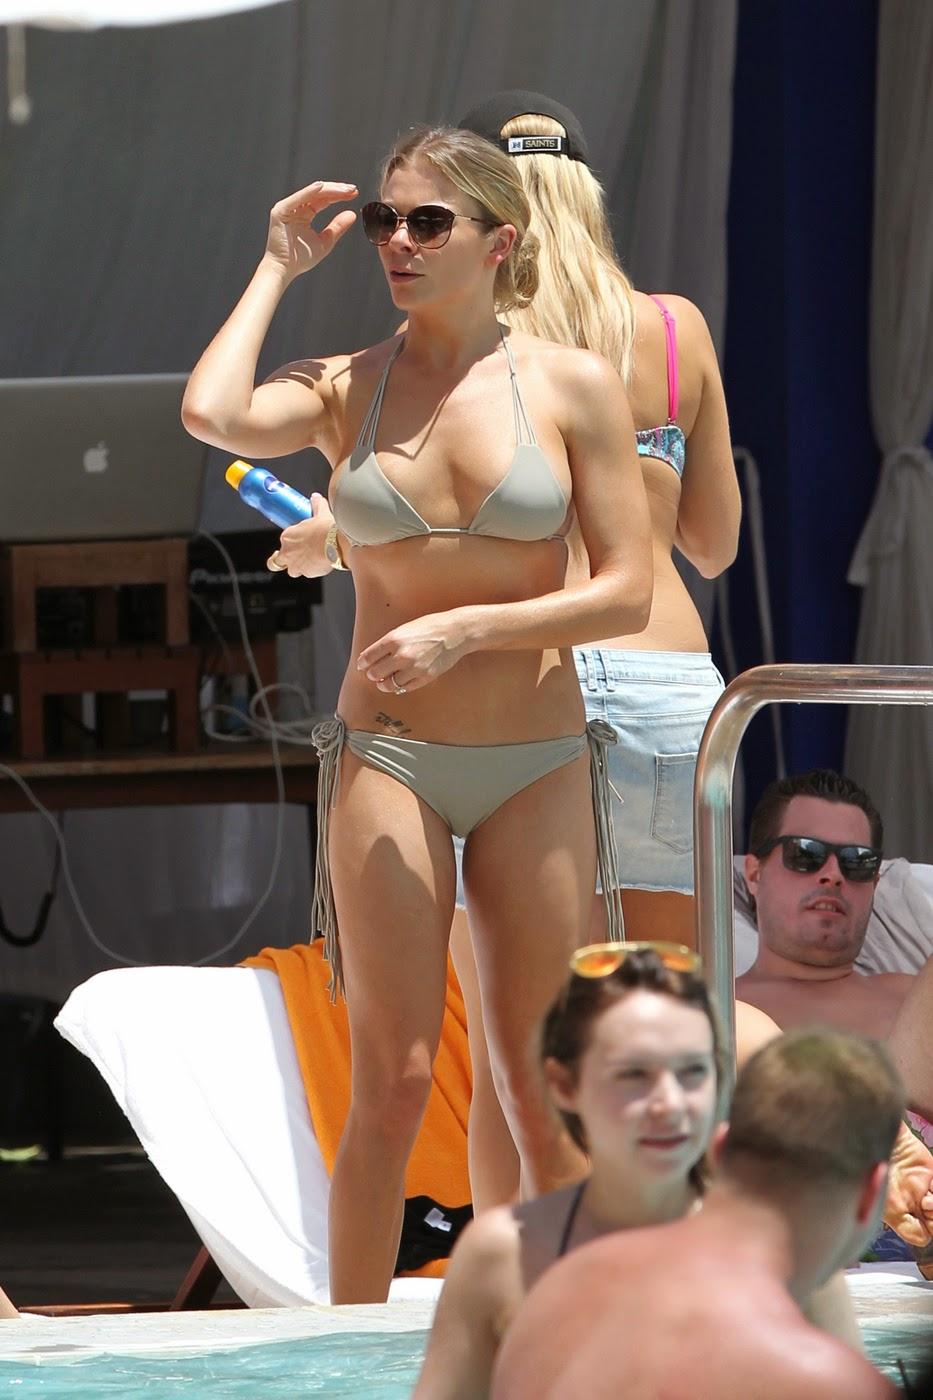 LeAnn Rimes desnuda - Página 4 fotos desnuda,